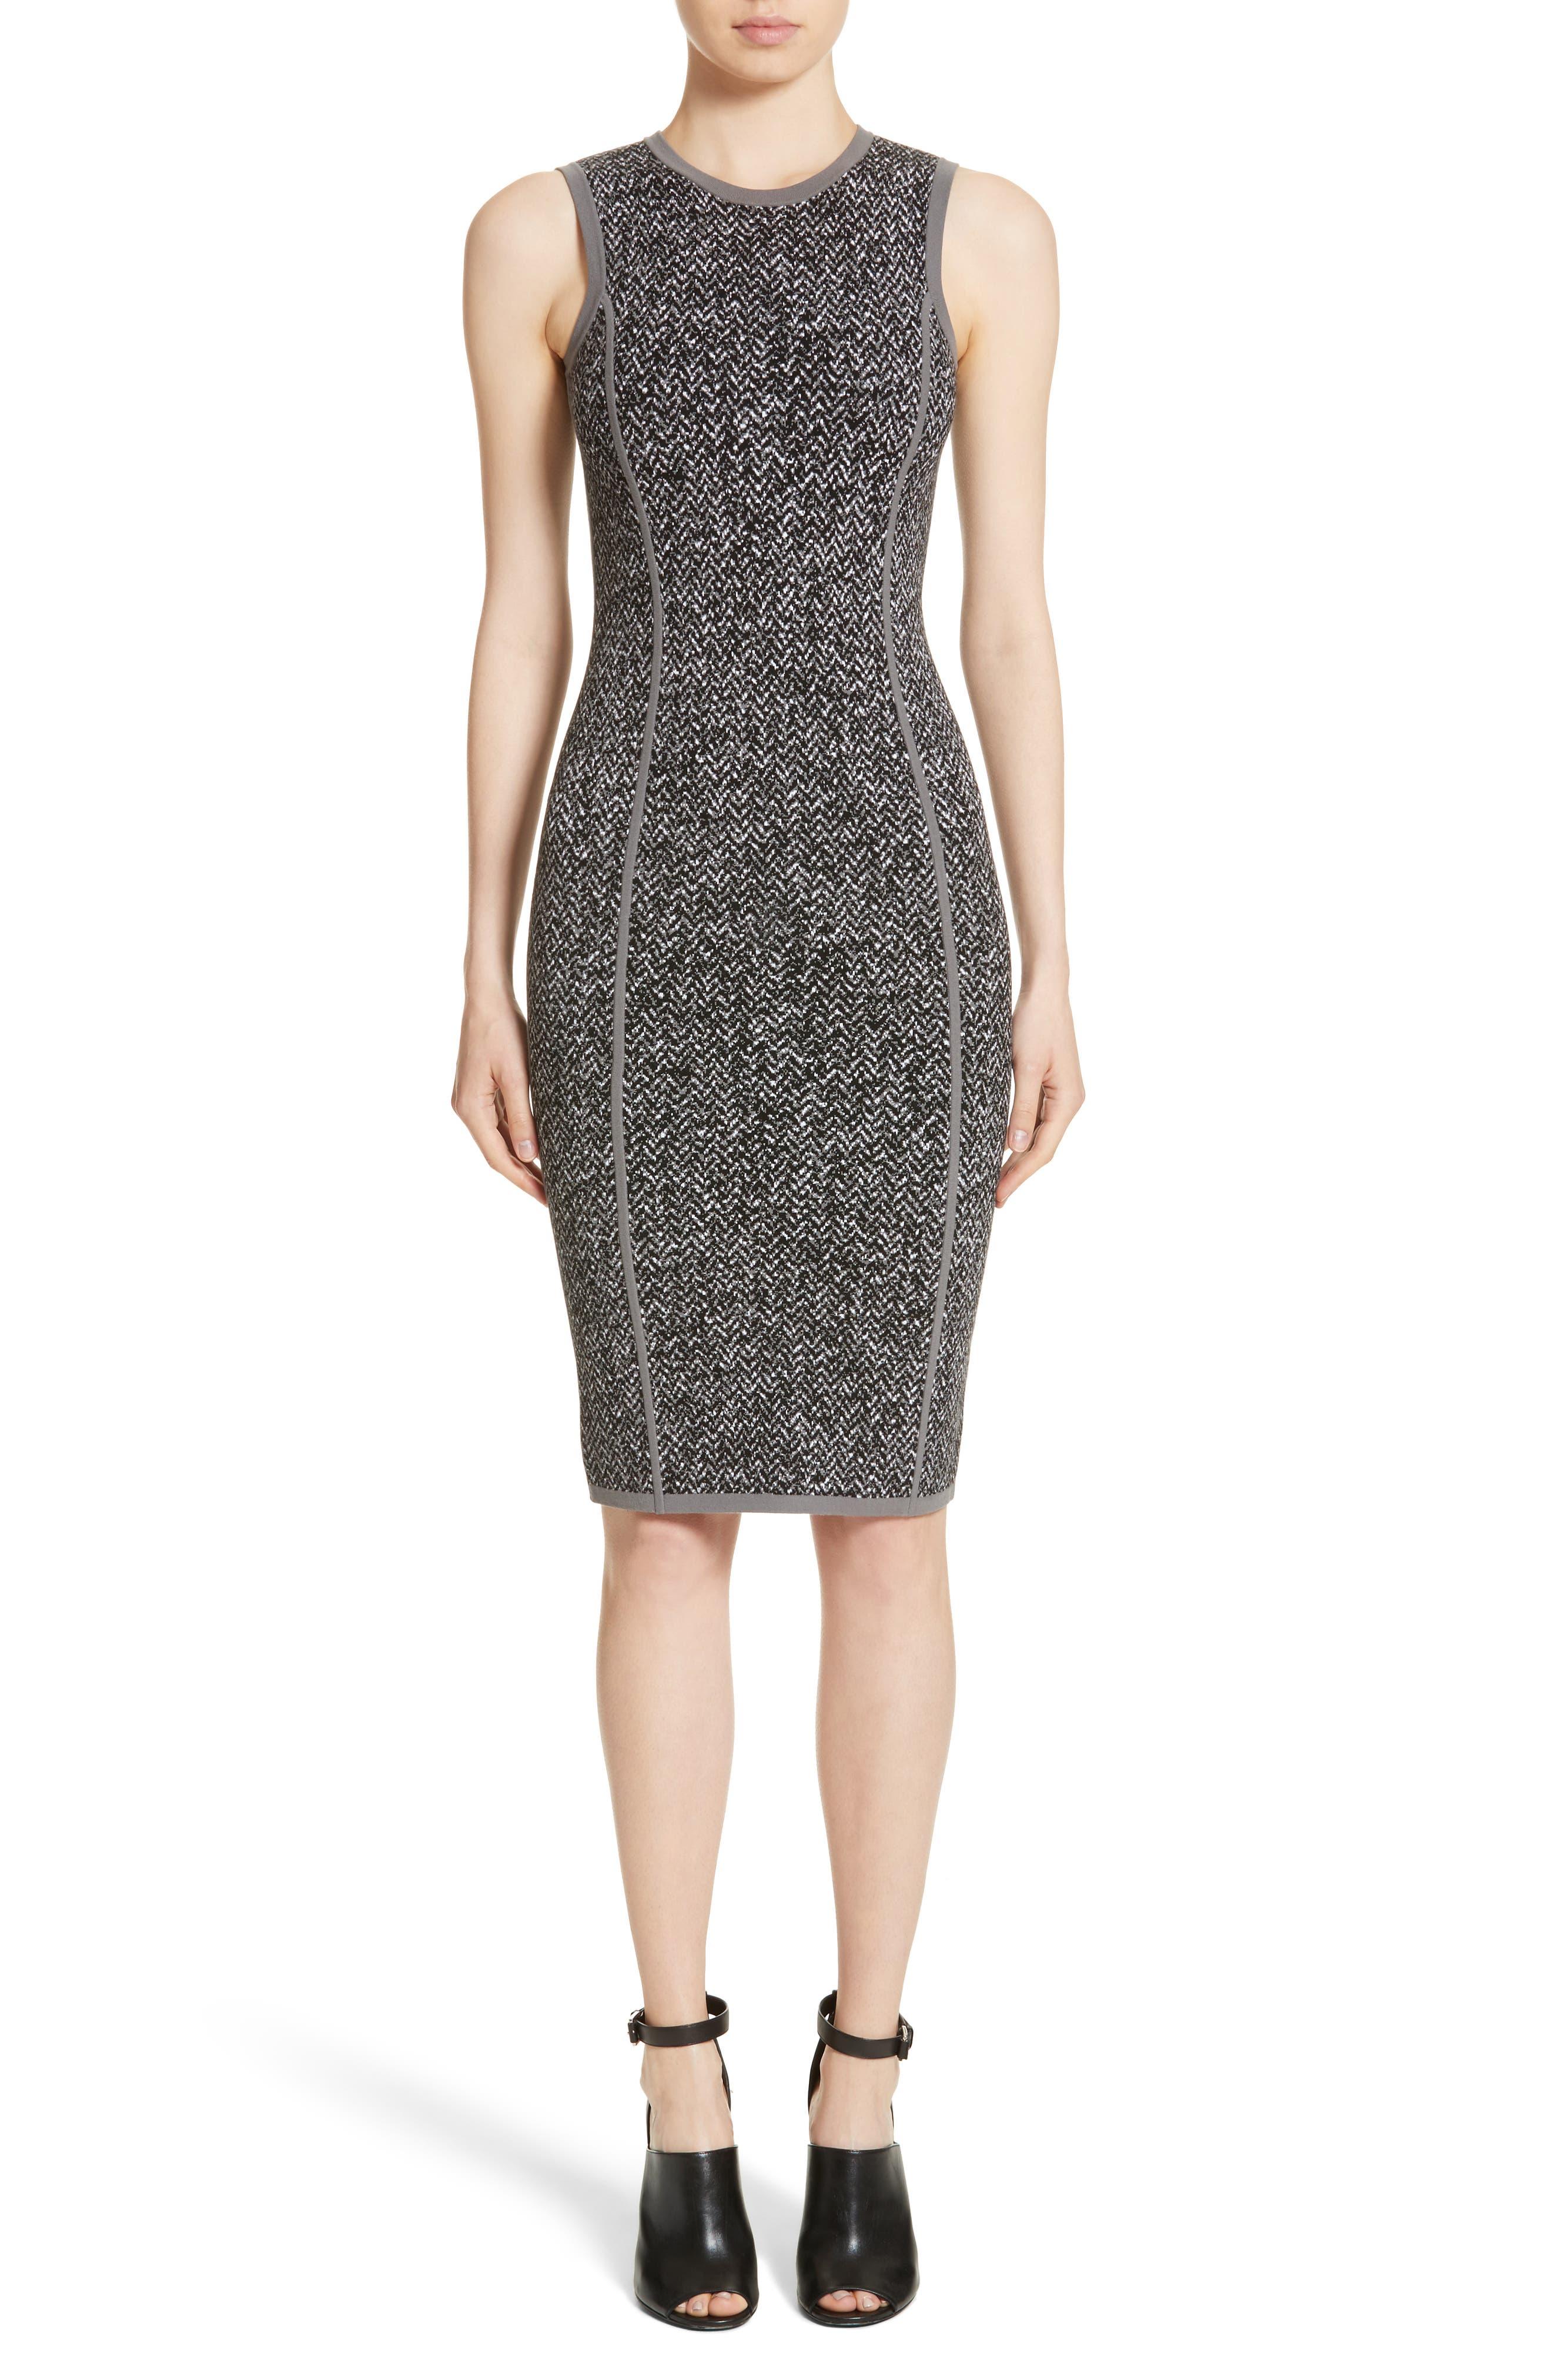 Michael Kors Stretch Tweed Jacquard Sheath Dress